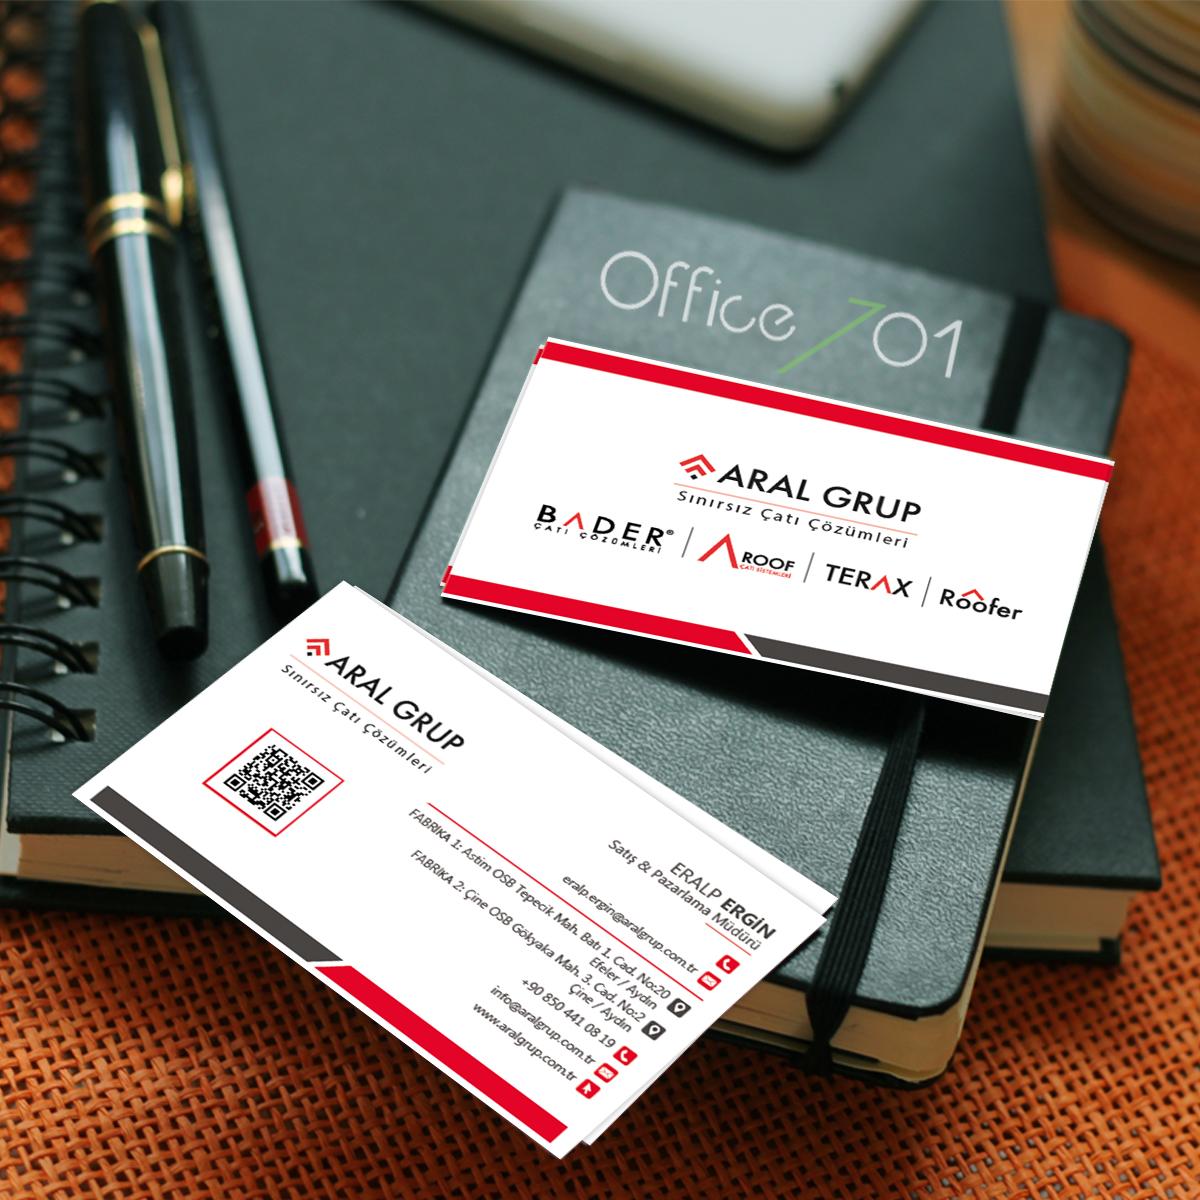 Office701 | Aral Grup | Corporate Identity Design